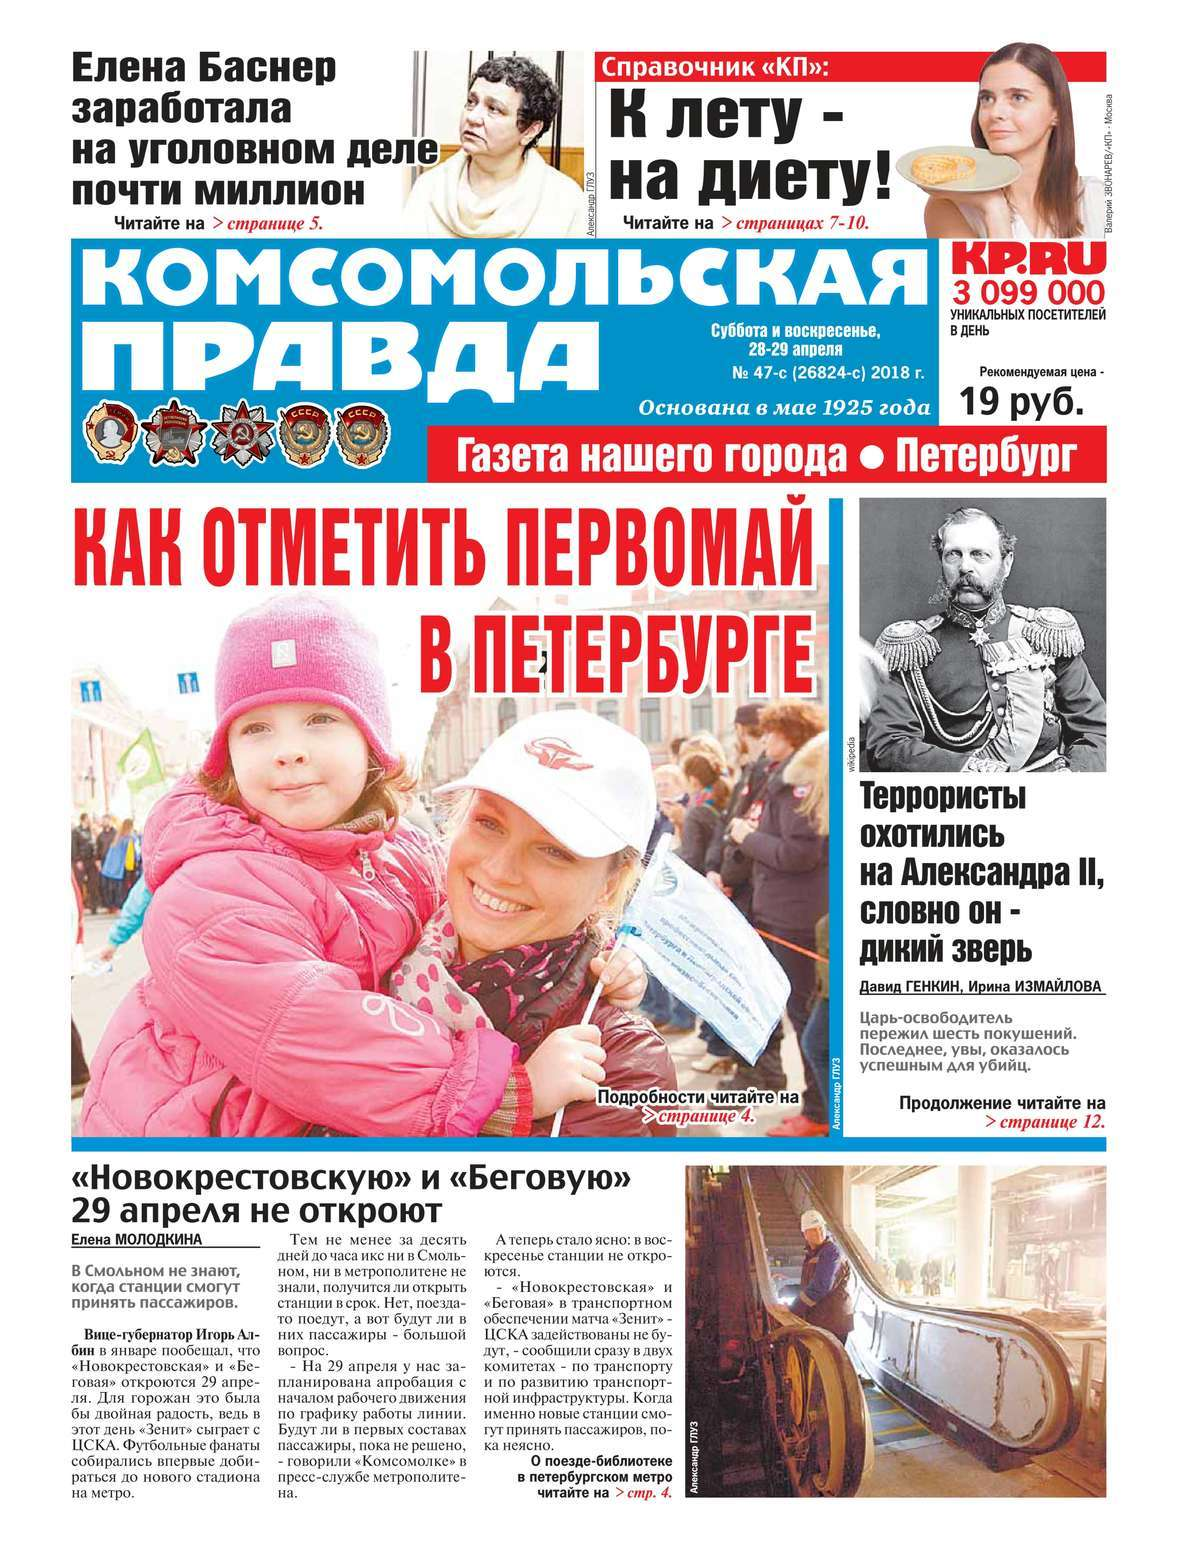 Редакция газеты Комсомольская правда. - Комсомольская Правда. - 47с-2018